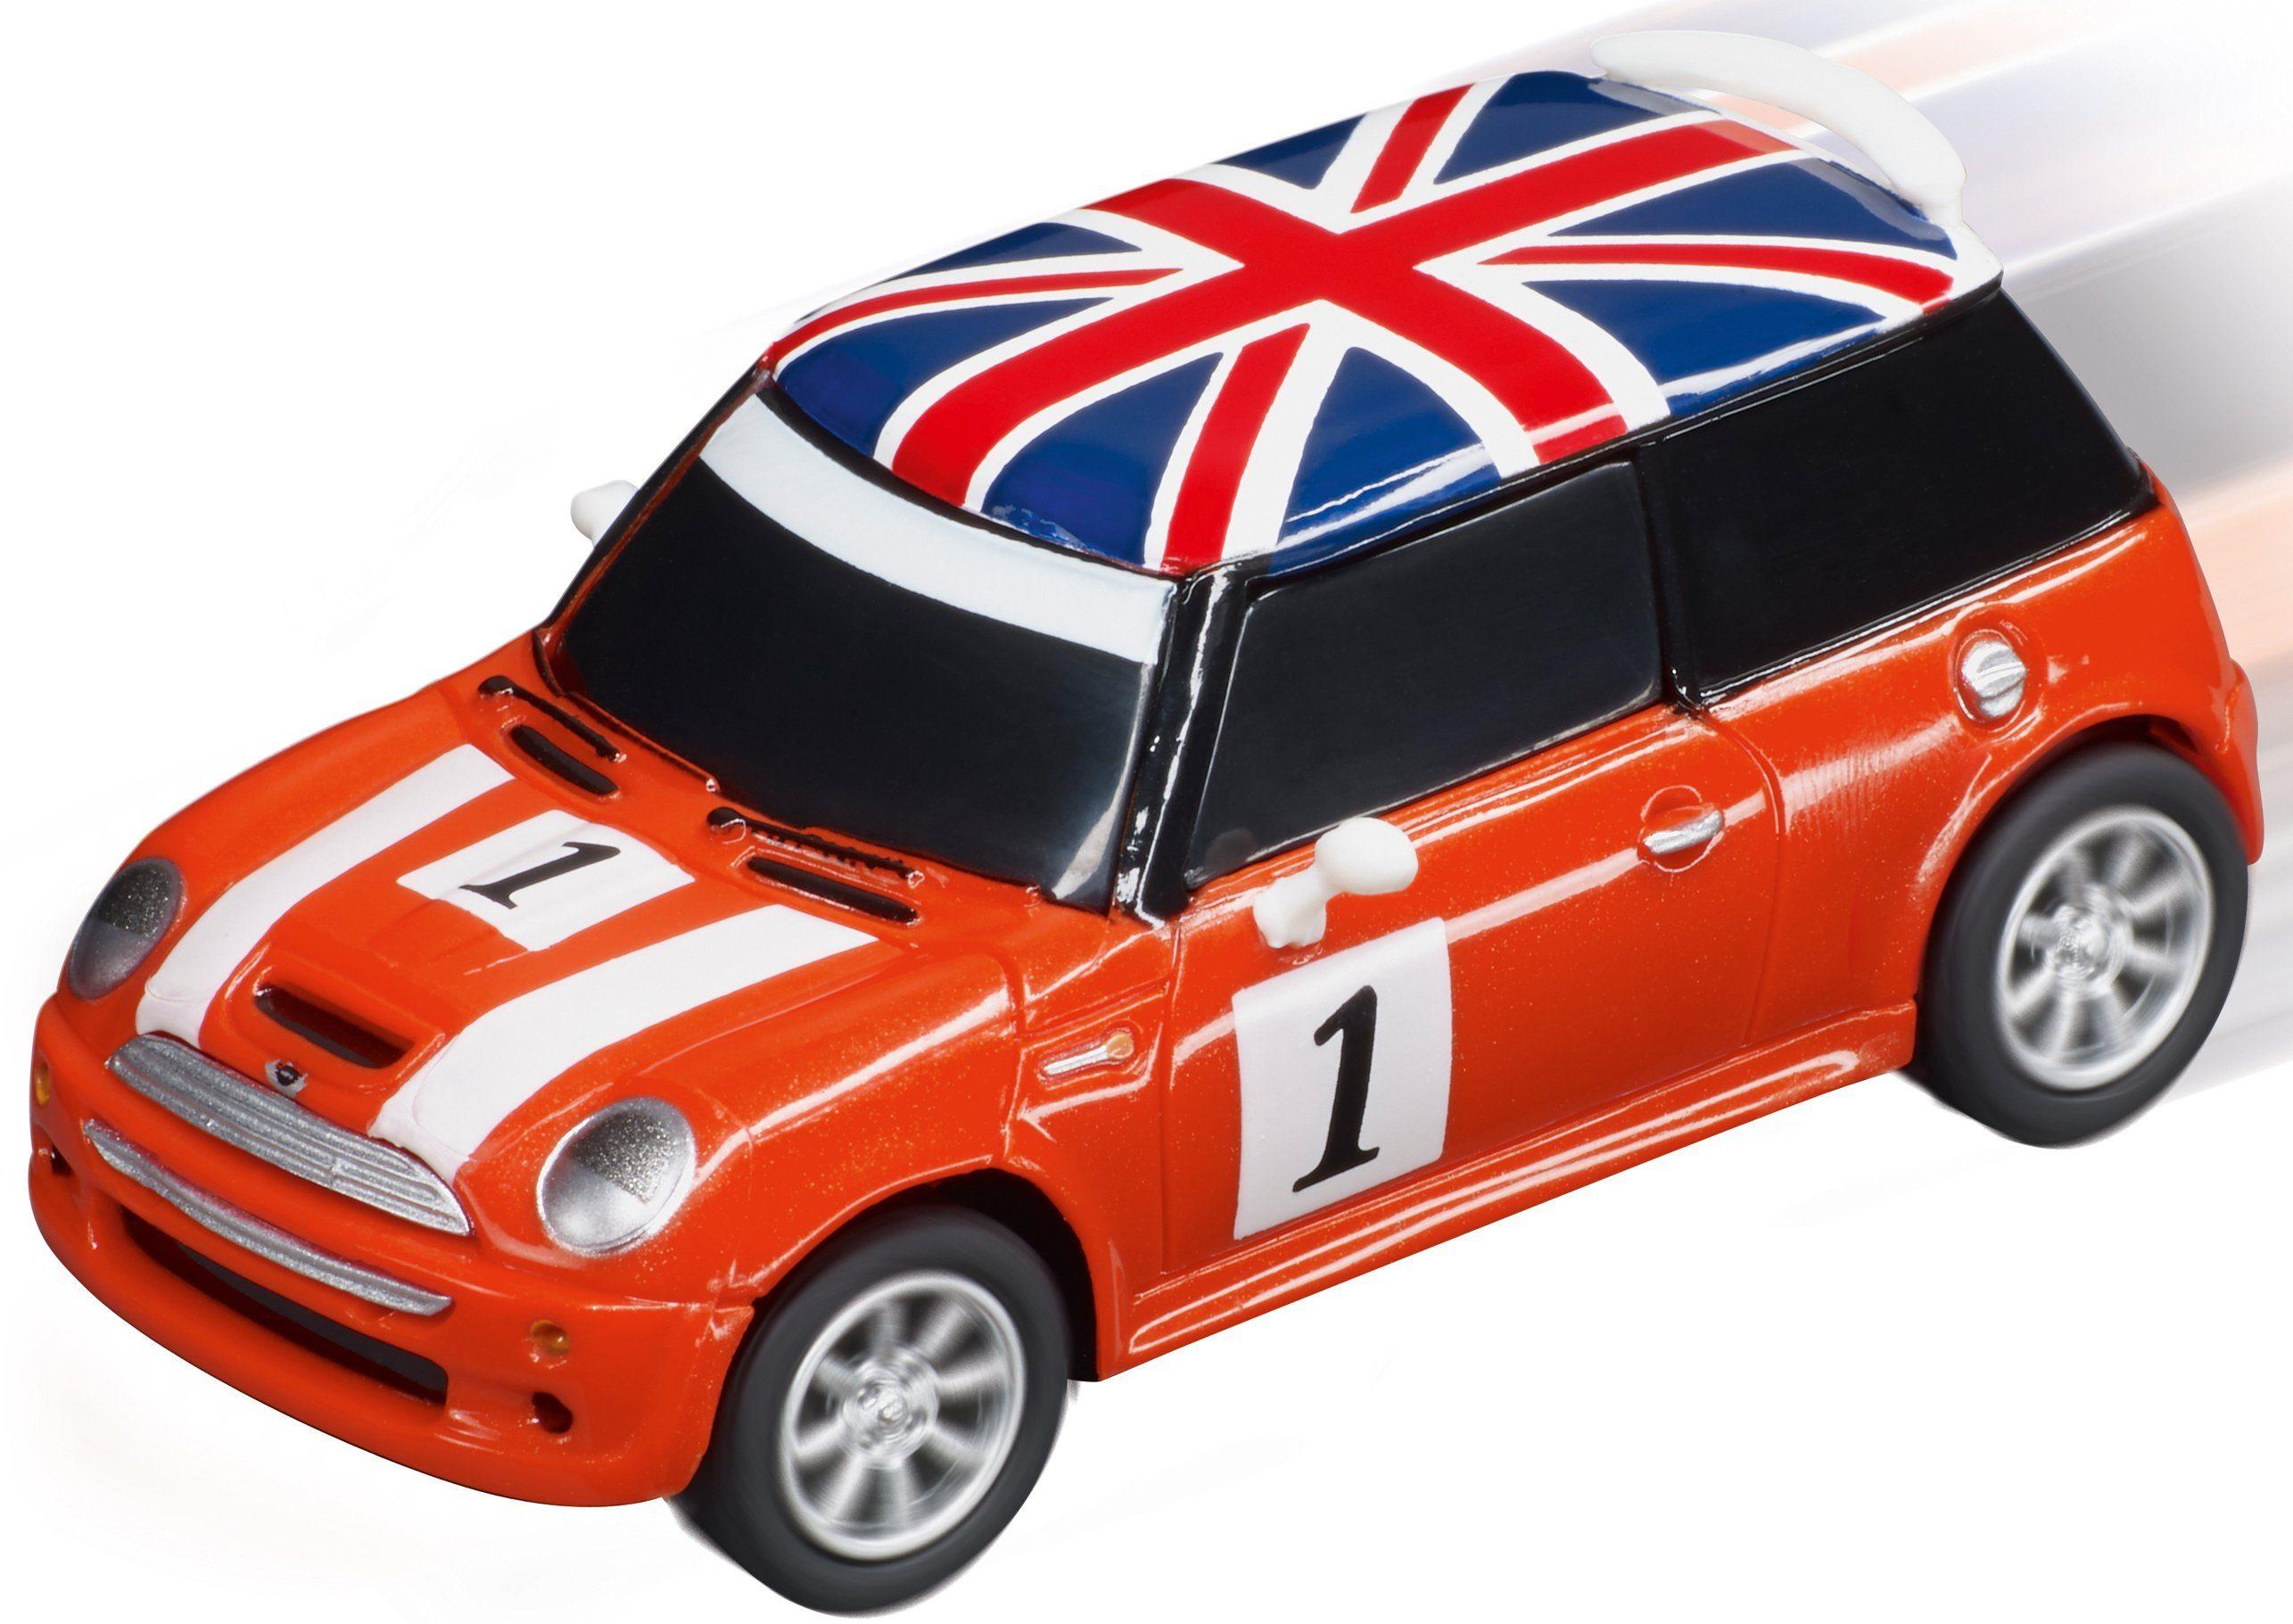 Carrera RC Komplettset, »Carrera® RC Mini Cooper S«